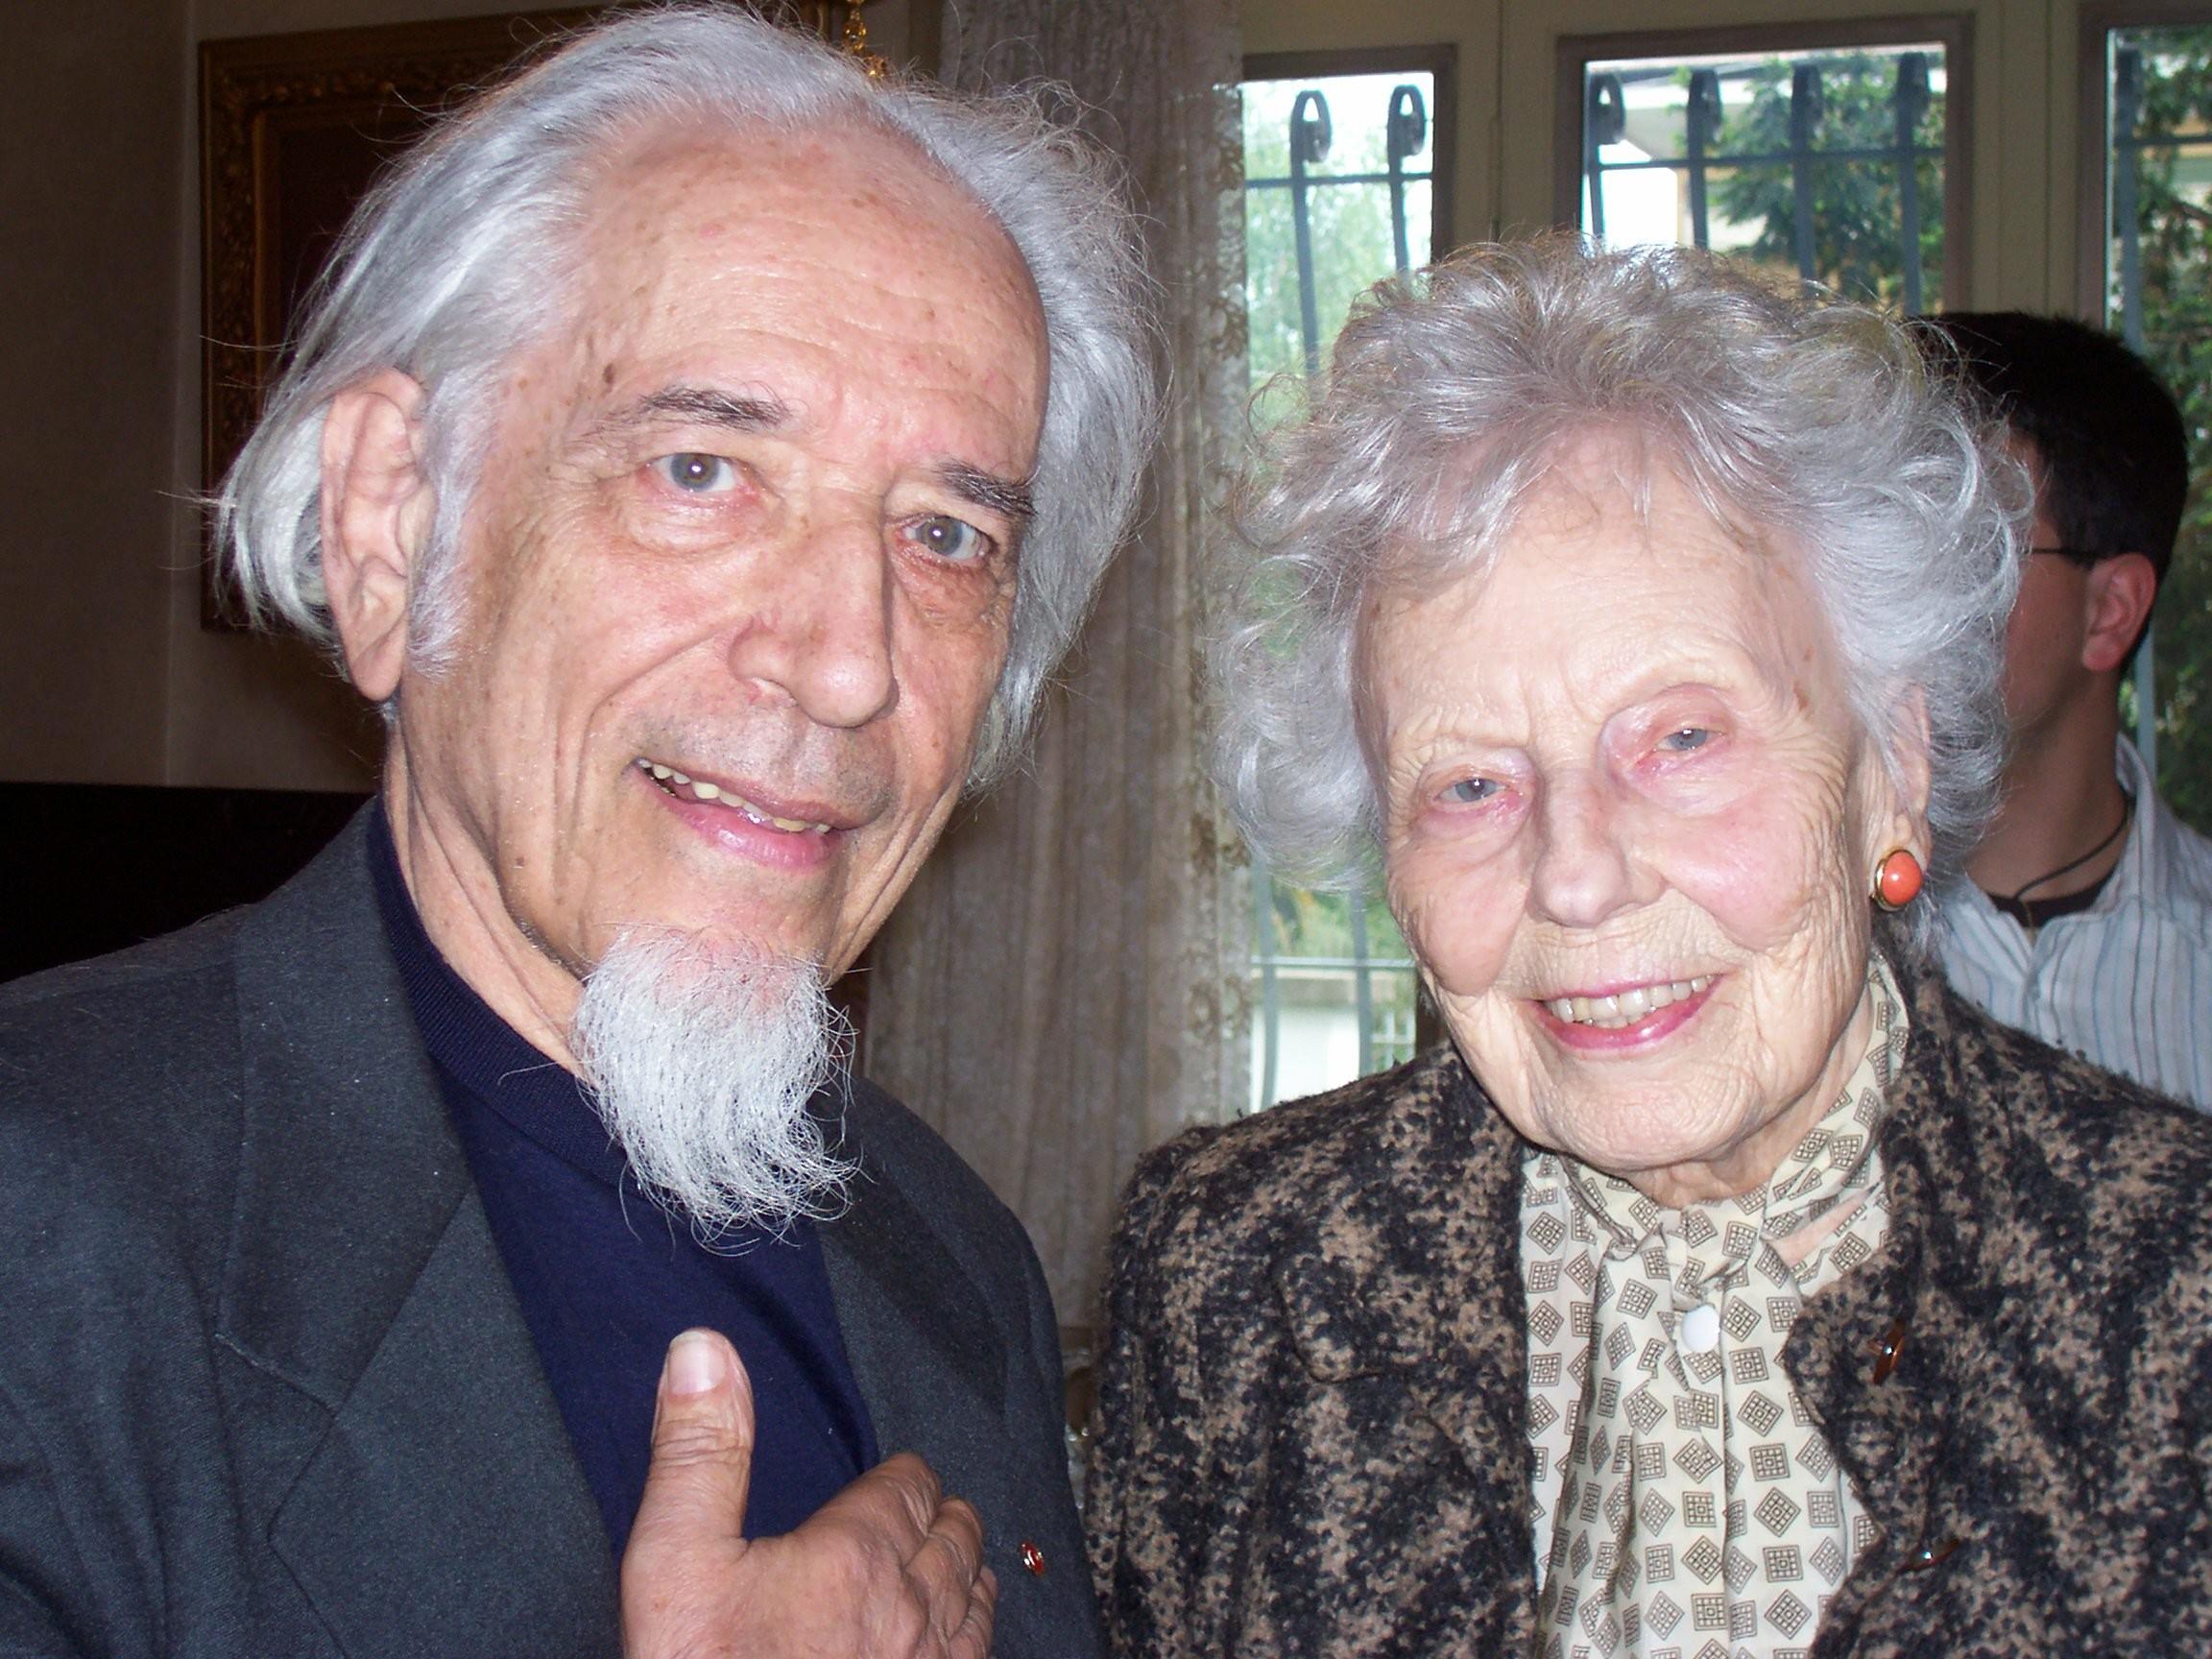 Mandel e soprano Magda Olivero